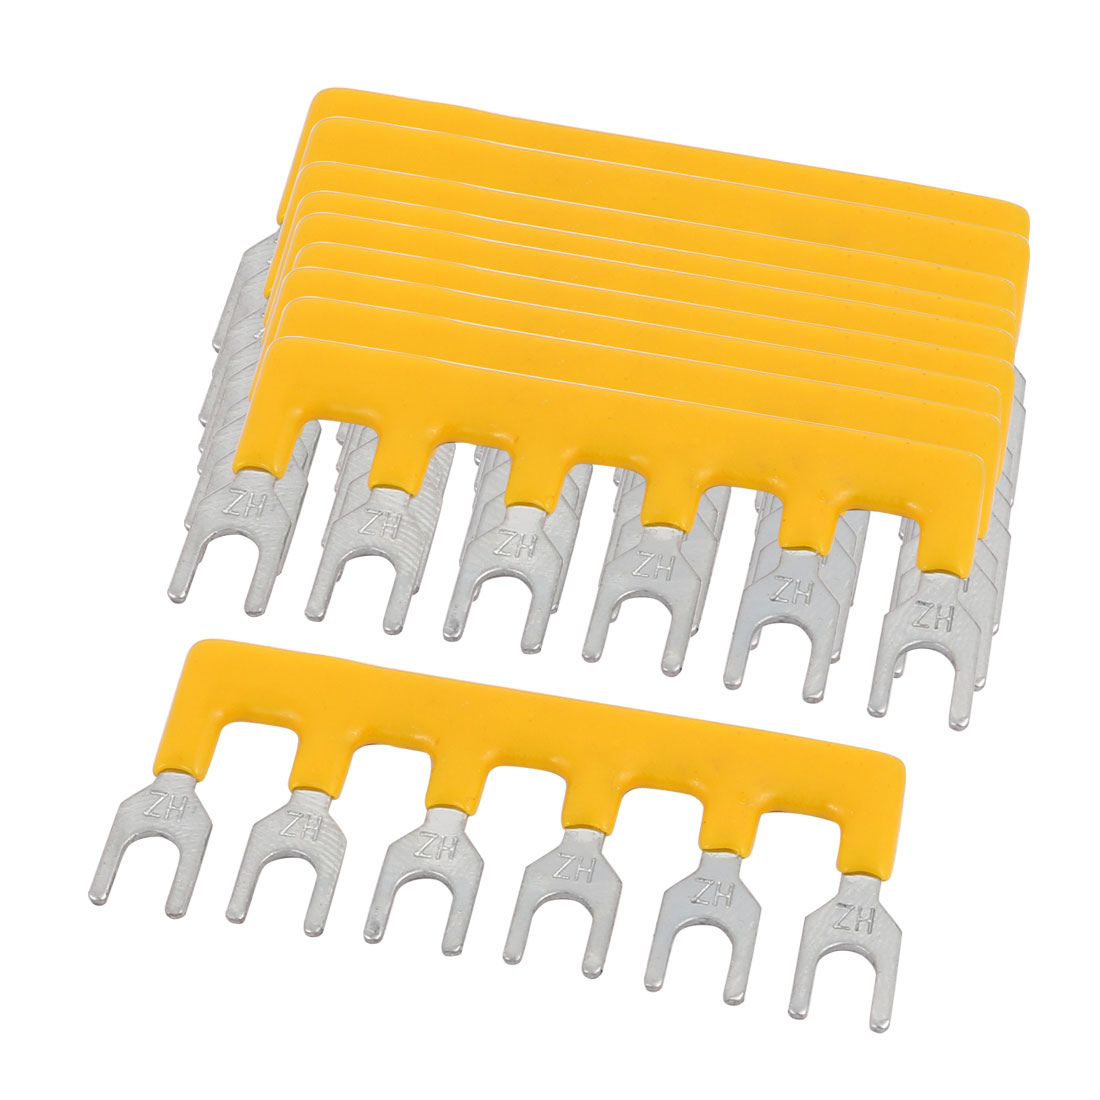 10 PCS 600V 15A 5.0mm Pitch 6 Position PCB Terminal Block Strip Barrier Yellow